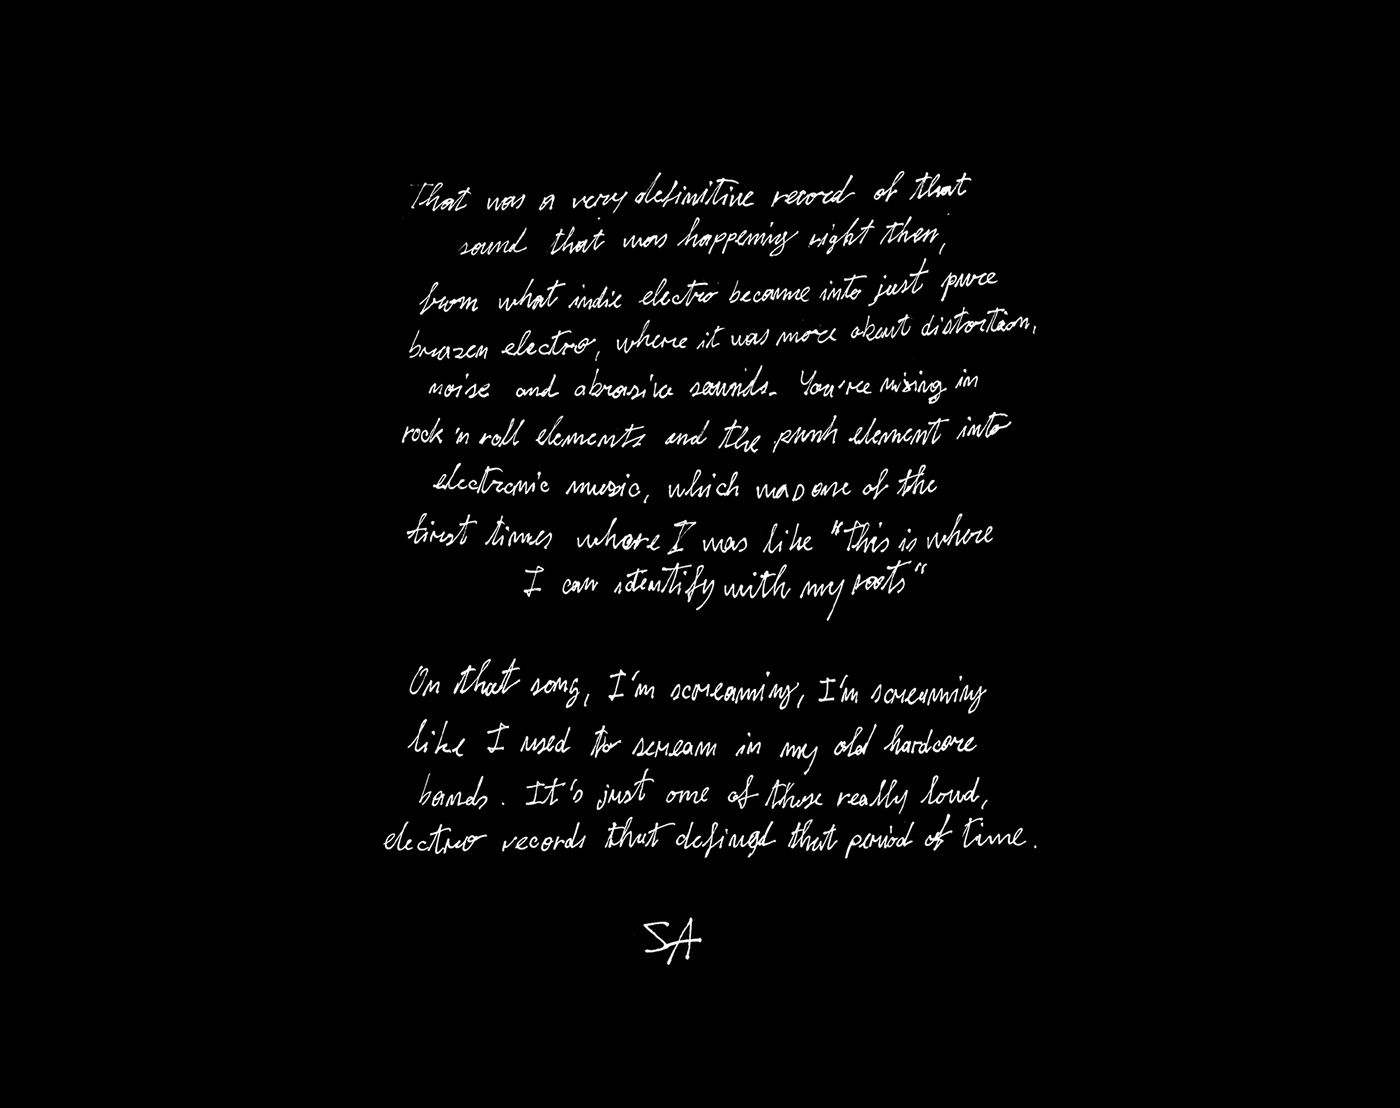 Monochrome Album Design for WARP - Steve Aoki and cie